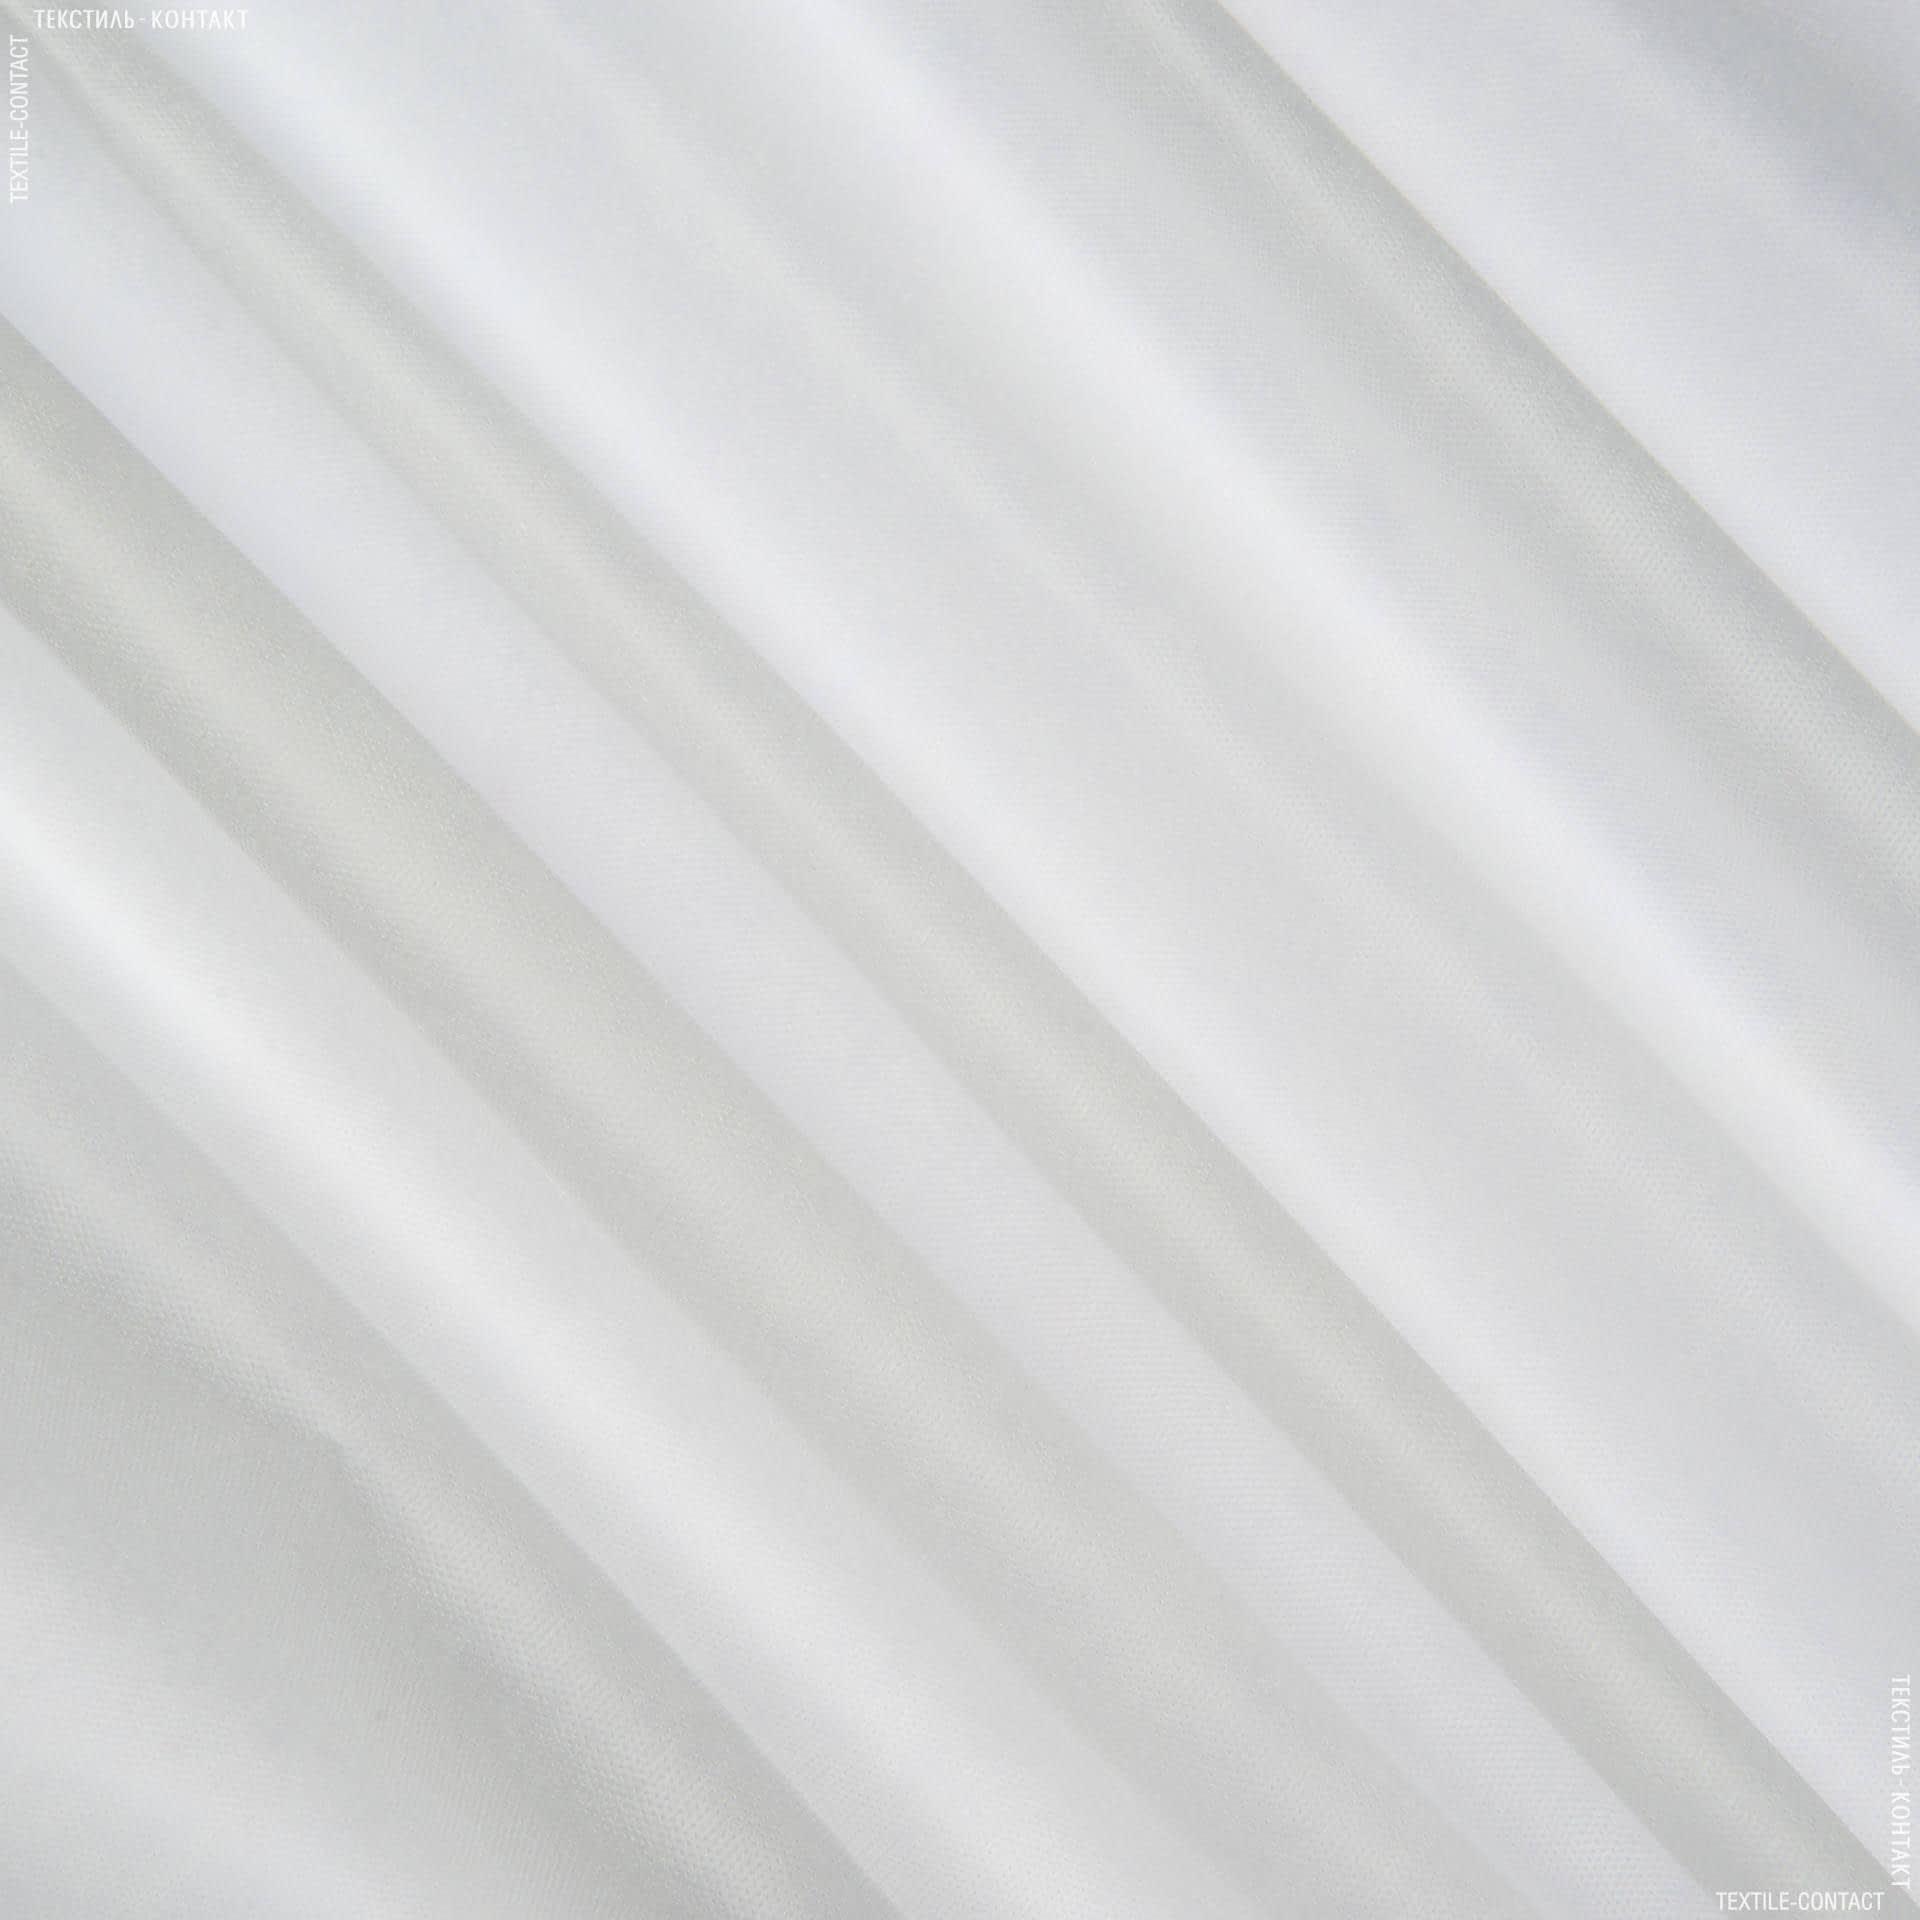 Ткани для мед. одежды - Спанбонд  60g  белый